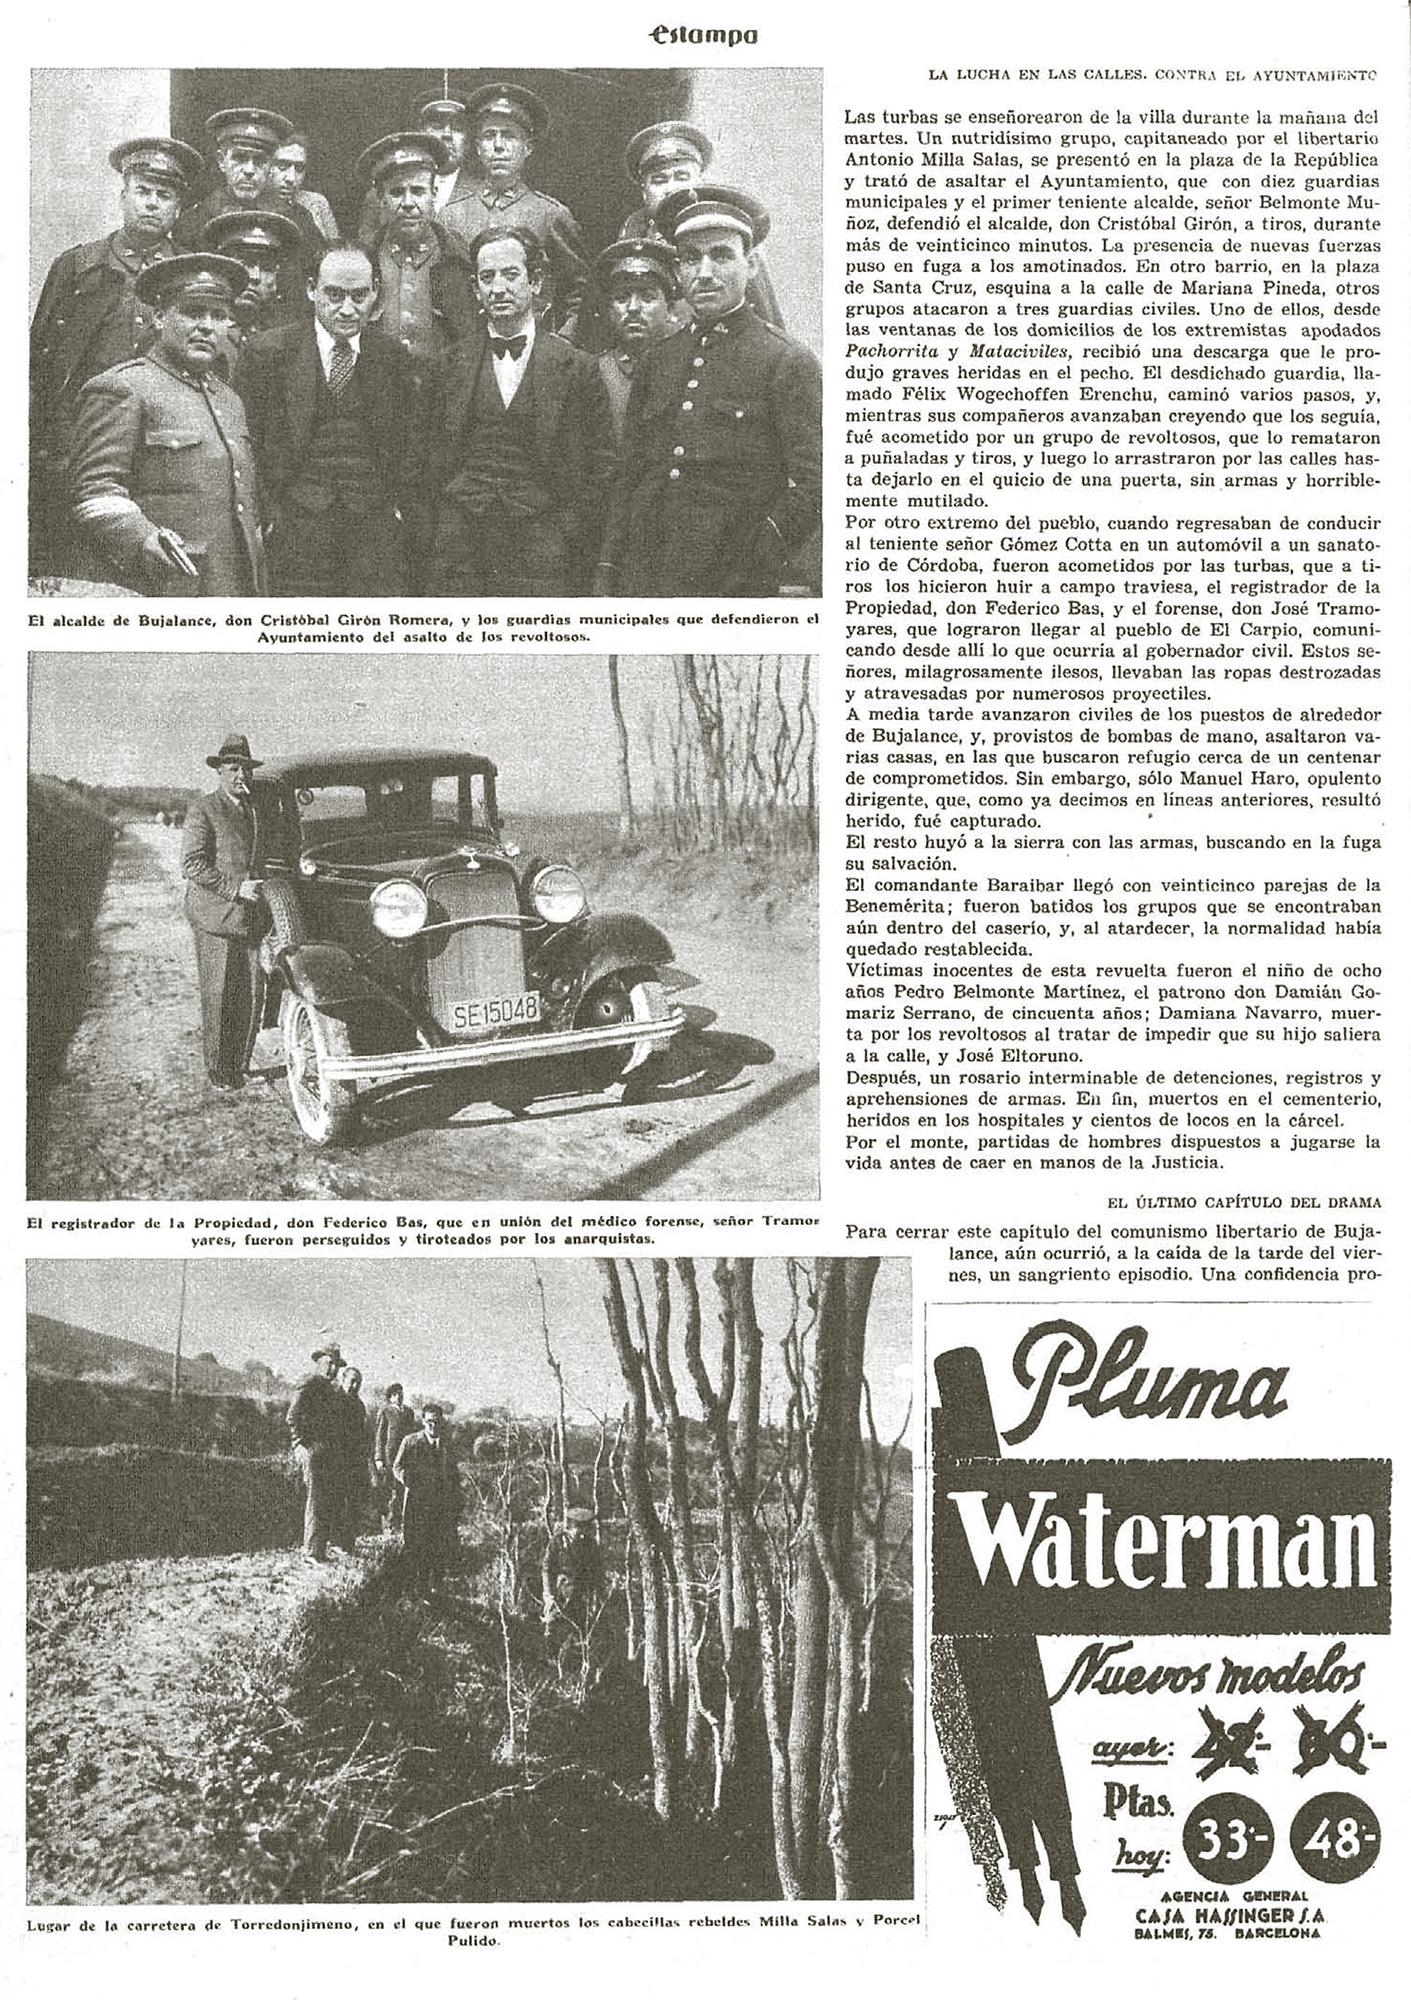 Bujalance 1933 Estampa p2